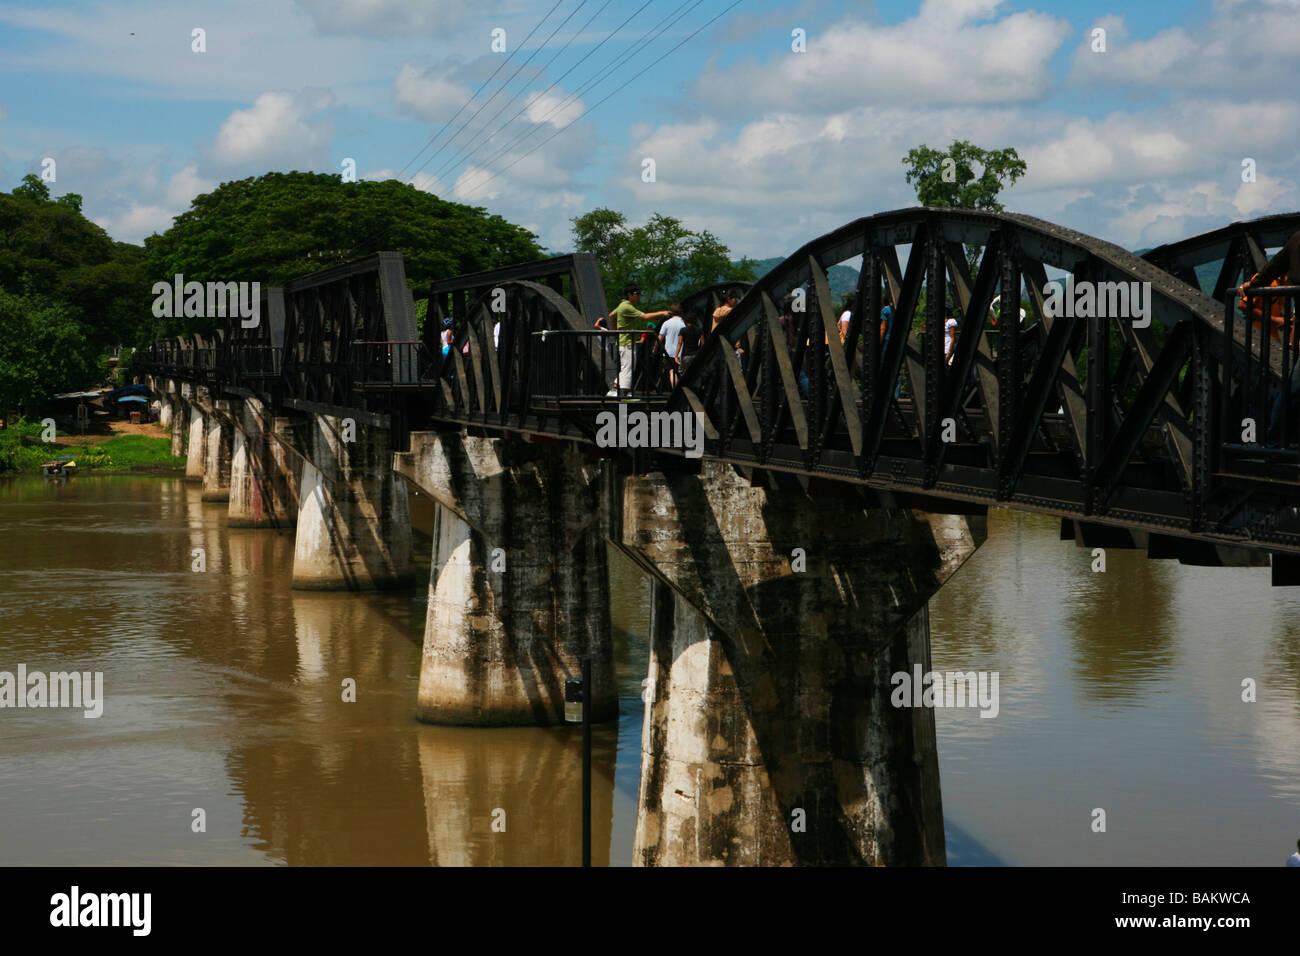 Bridge over the River Kwai, Kanchanaburi, Bangkok, Thailand Stock Photo, Roya...